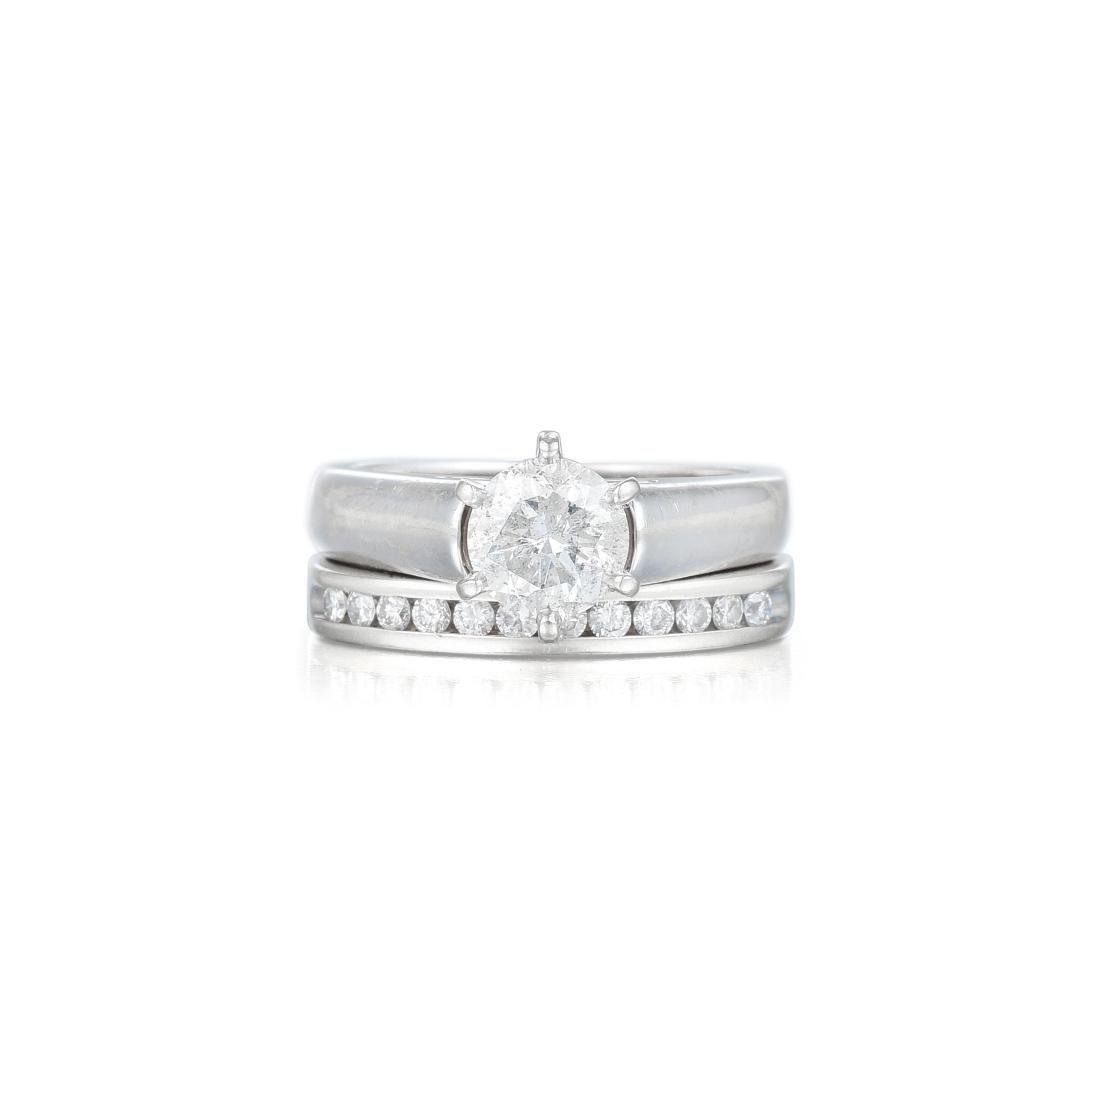 A Ladies Diamond Wedding Set